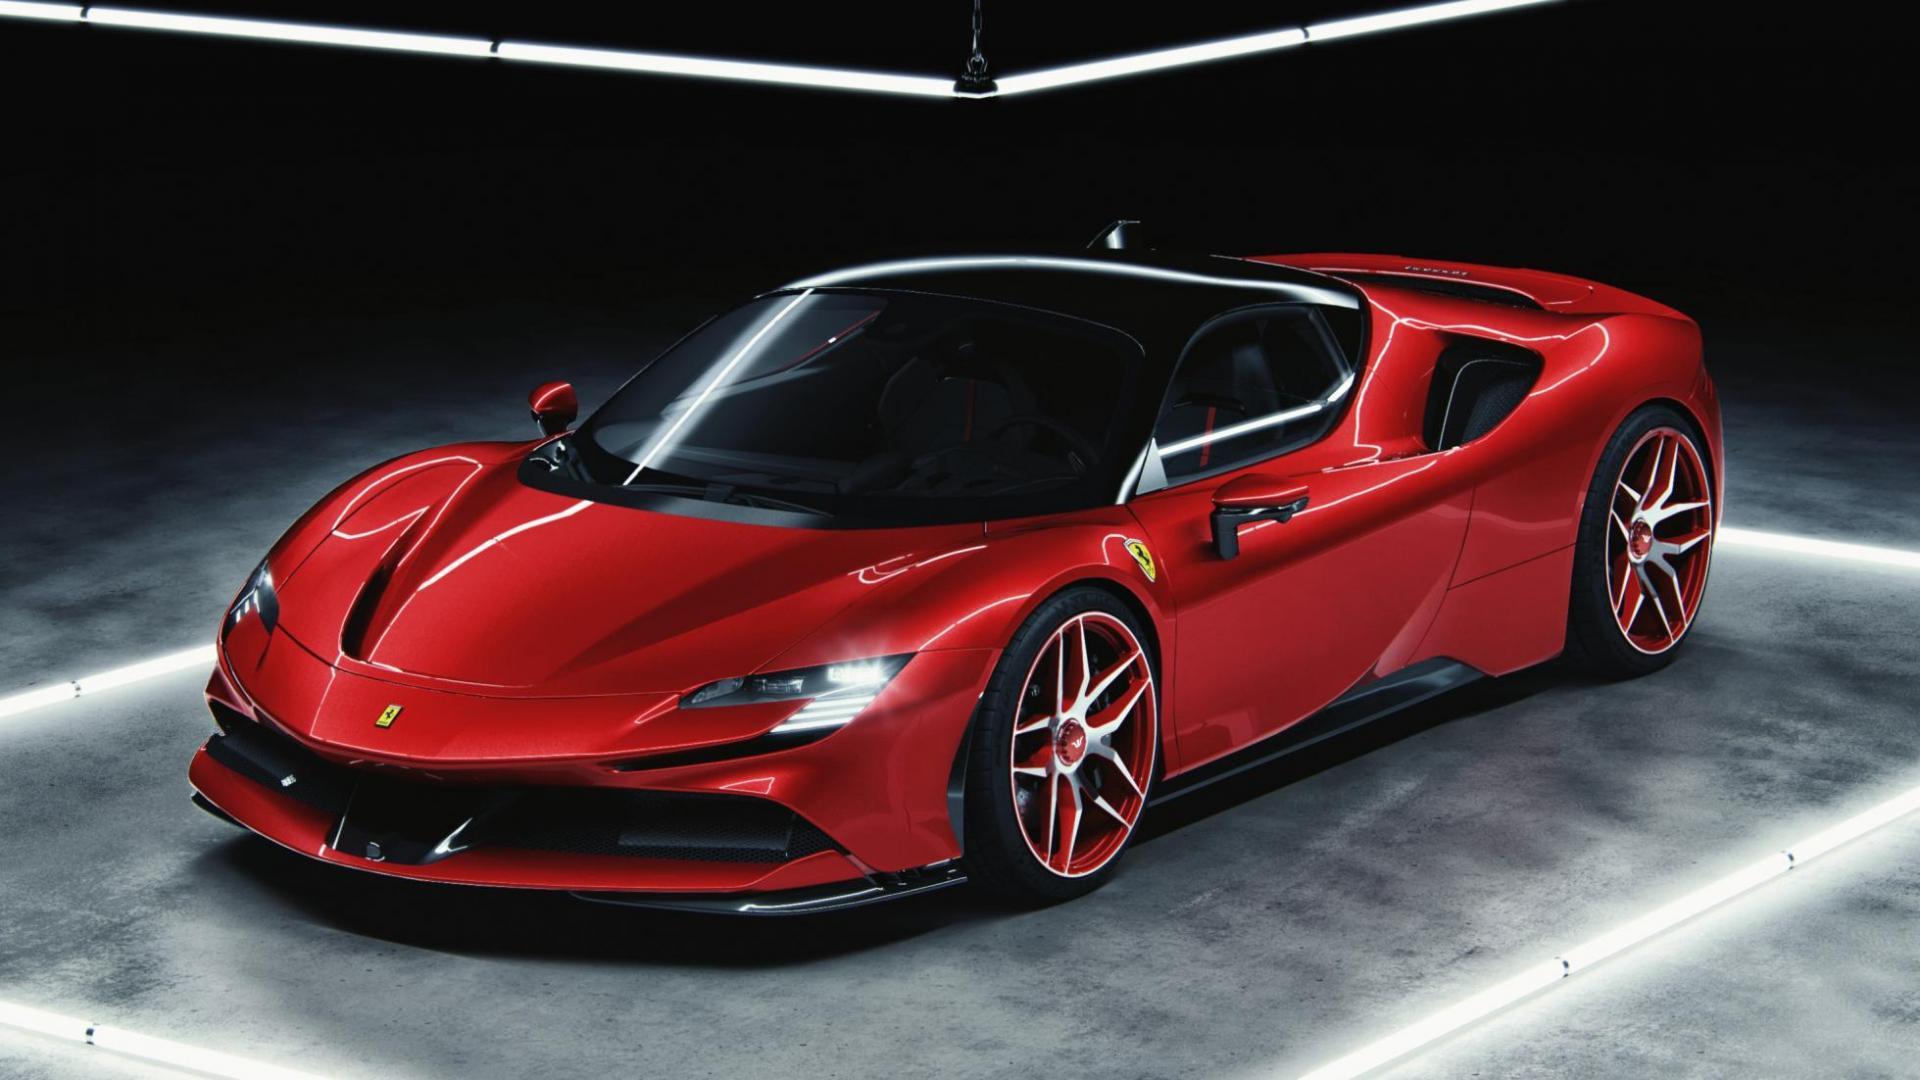 Ferrari sf90 stradale 2020 rosso corsa cam 2b hr